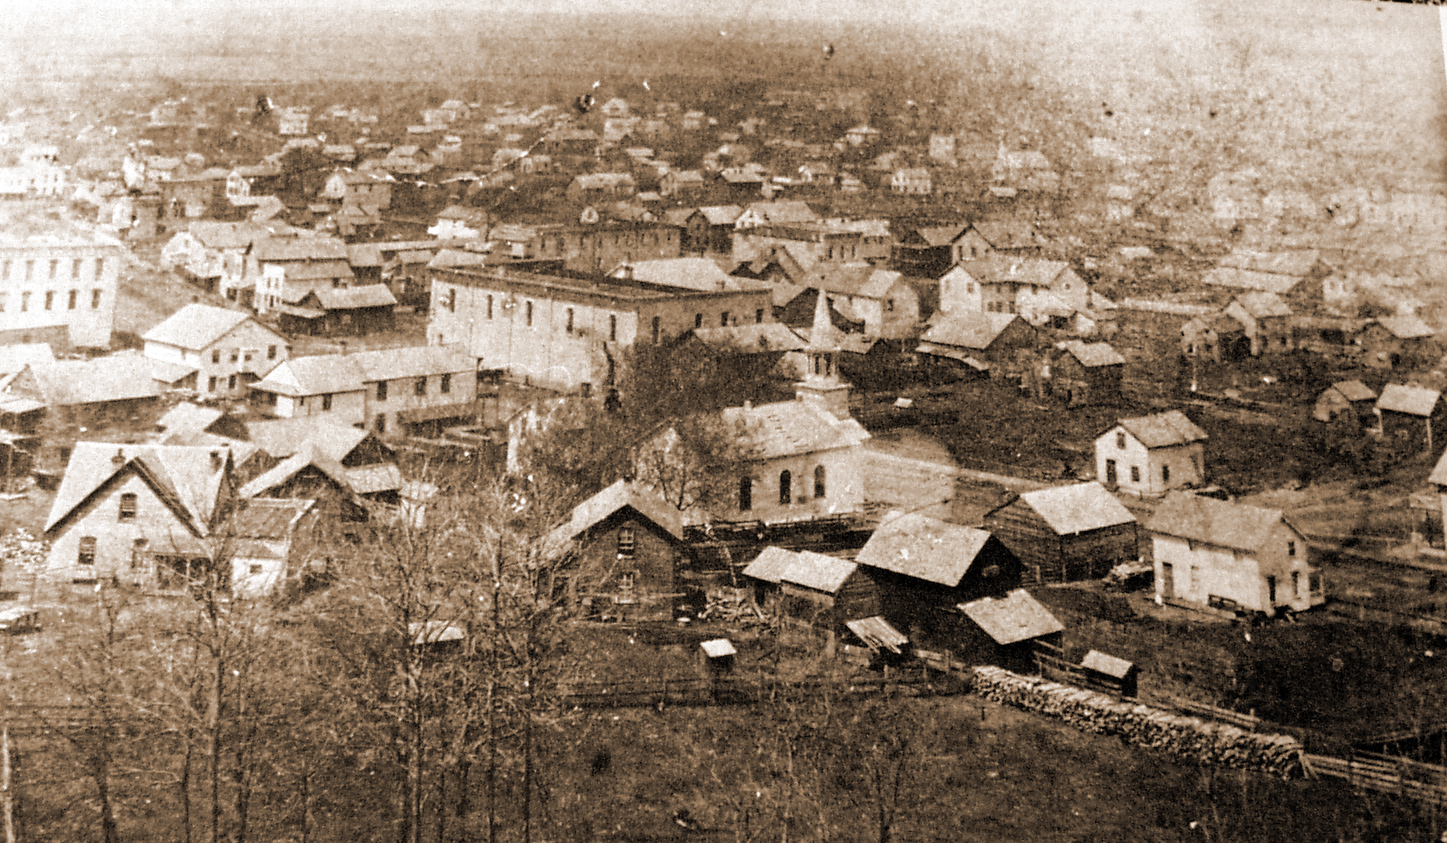 History – City of Jordan, Minnesota